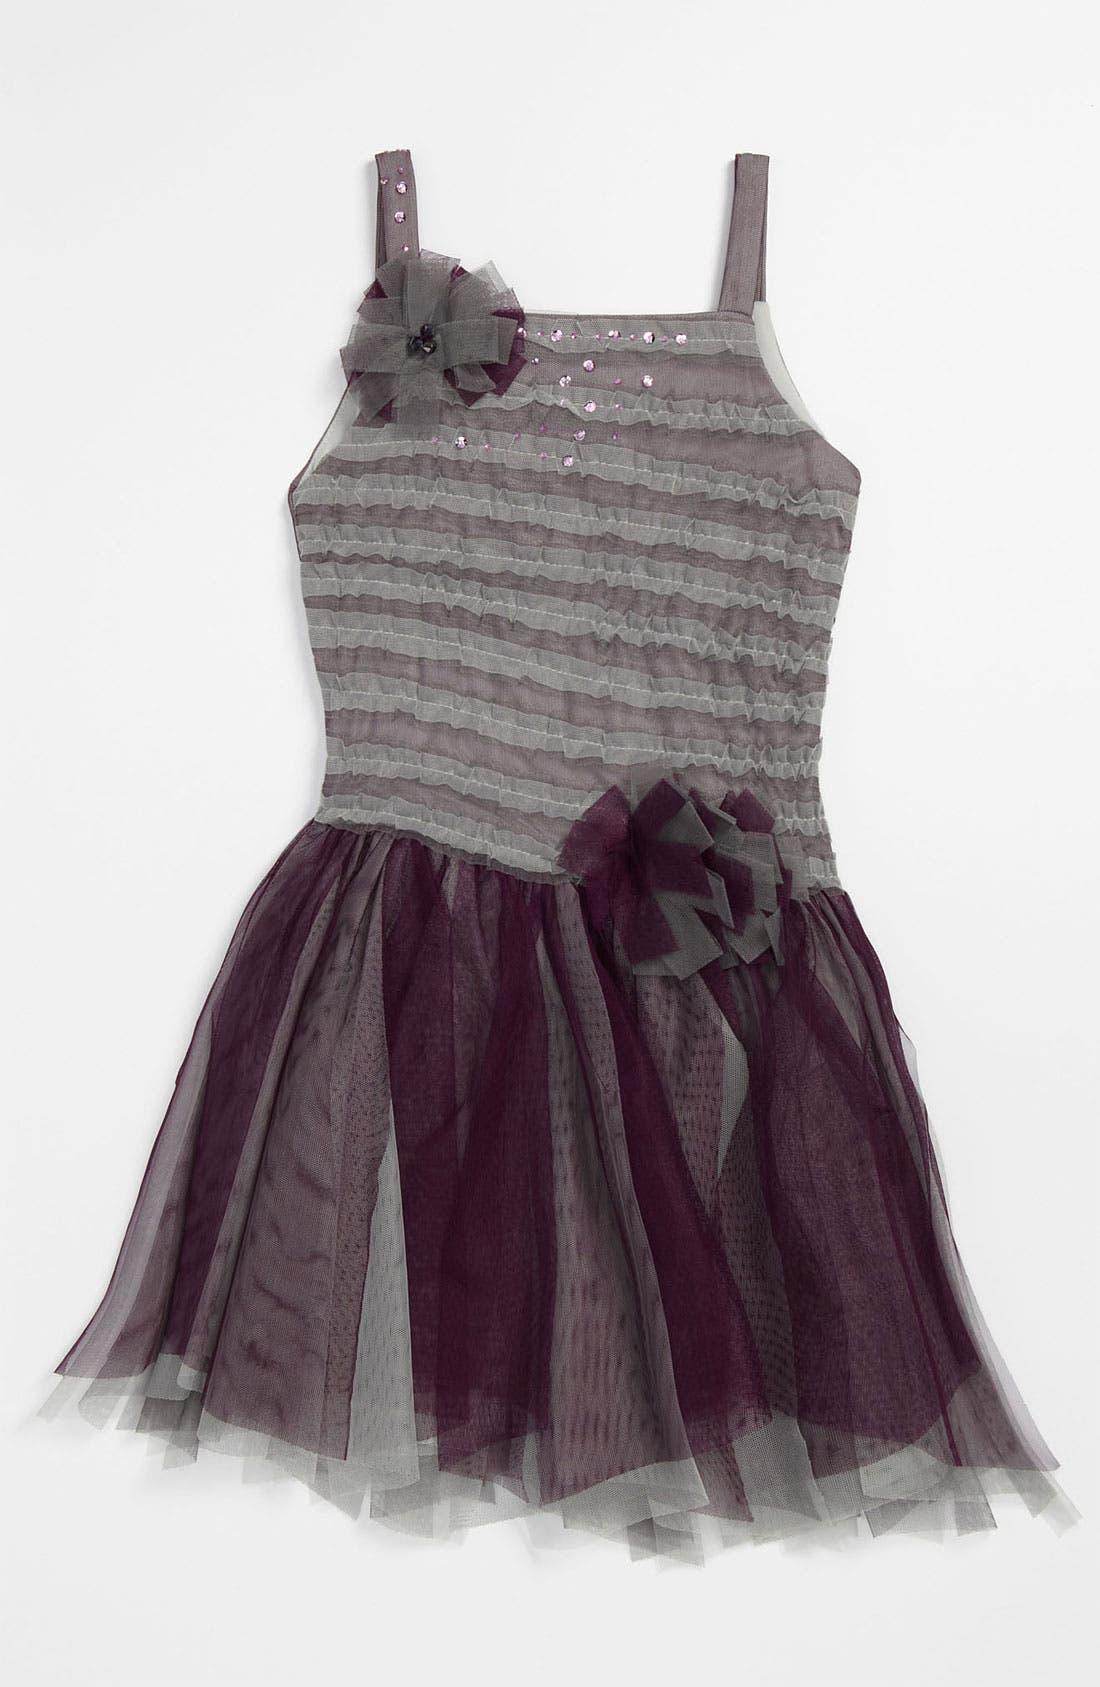 Main Image - Isobella & Chloe 'Plum Kiss' Dress (Little Girls & Big Girls)